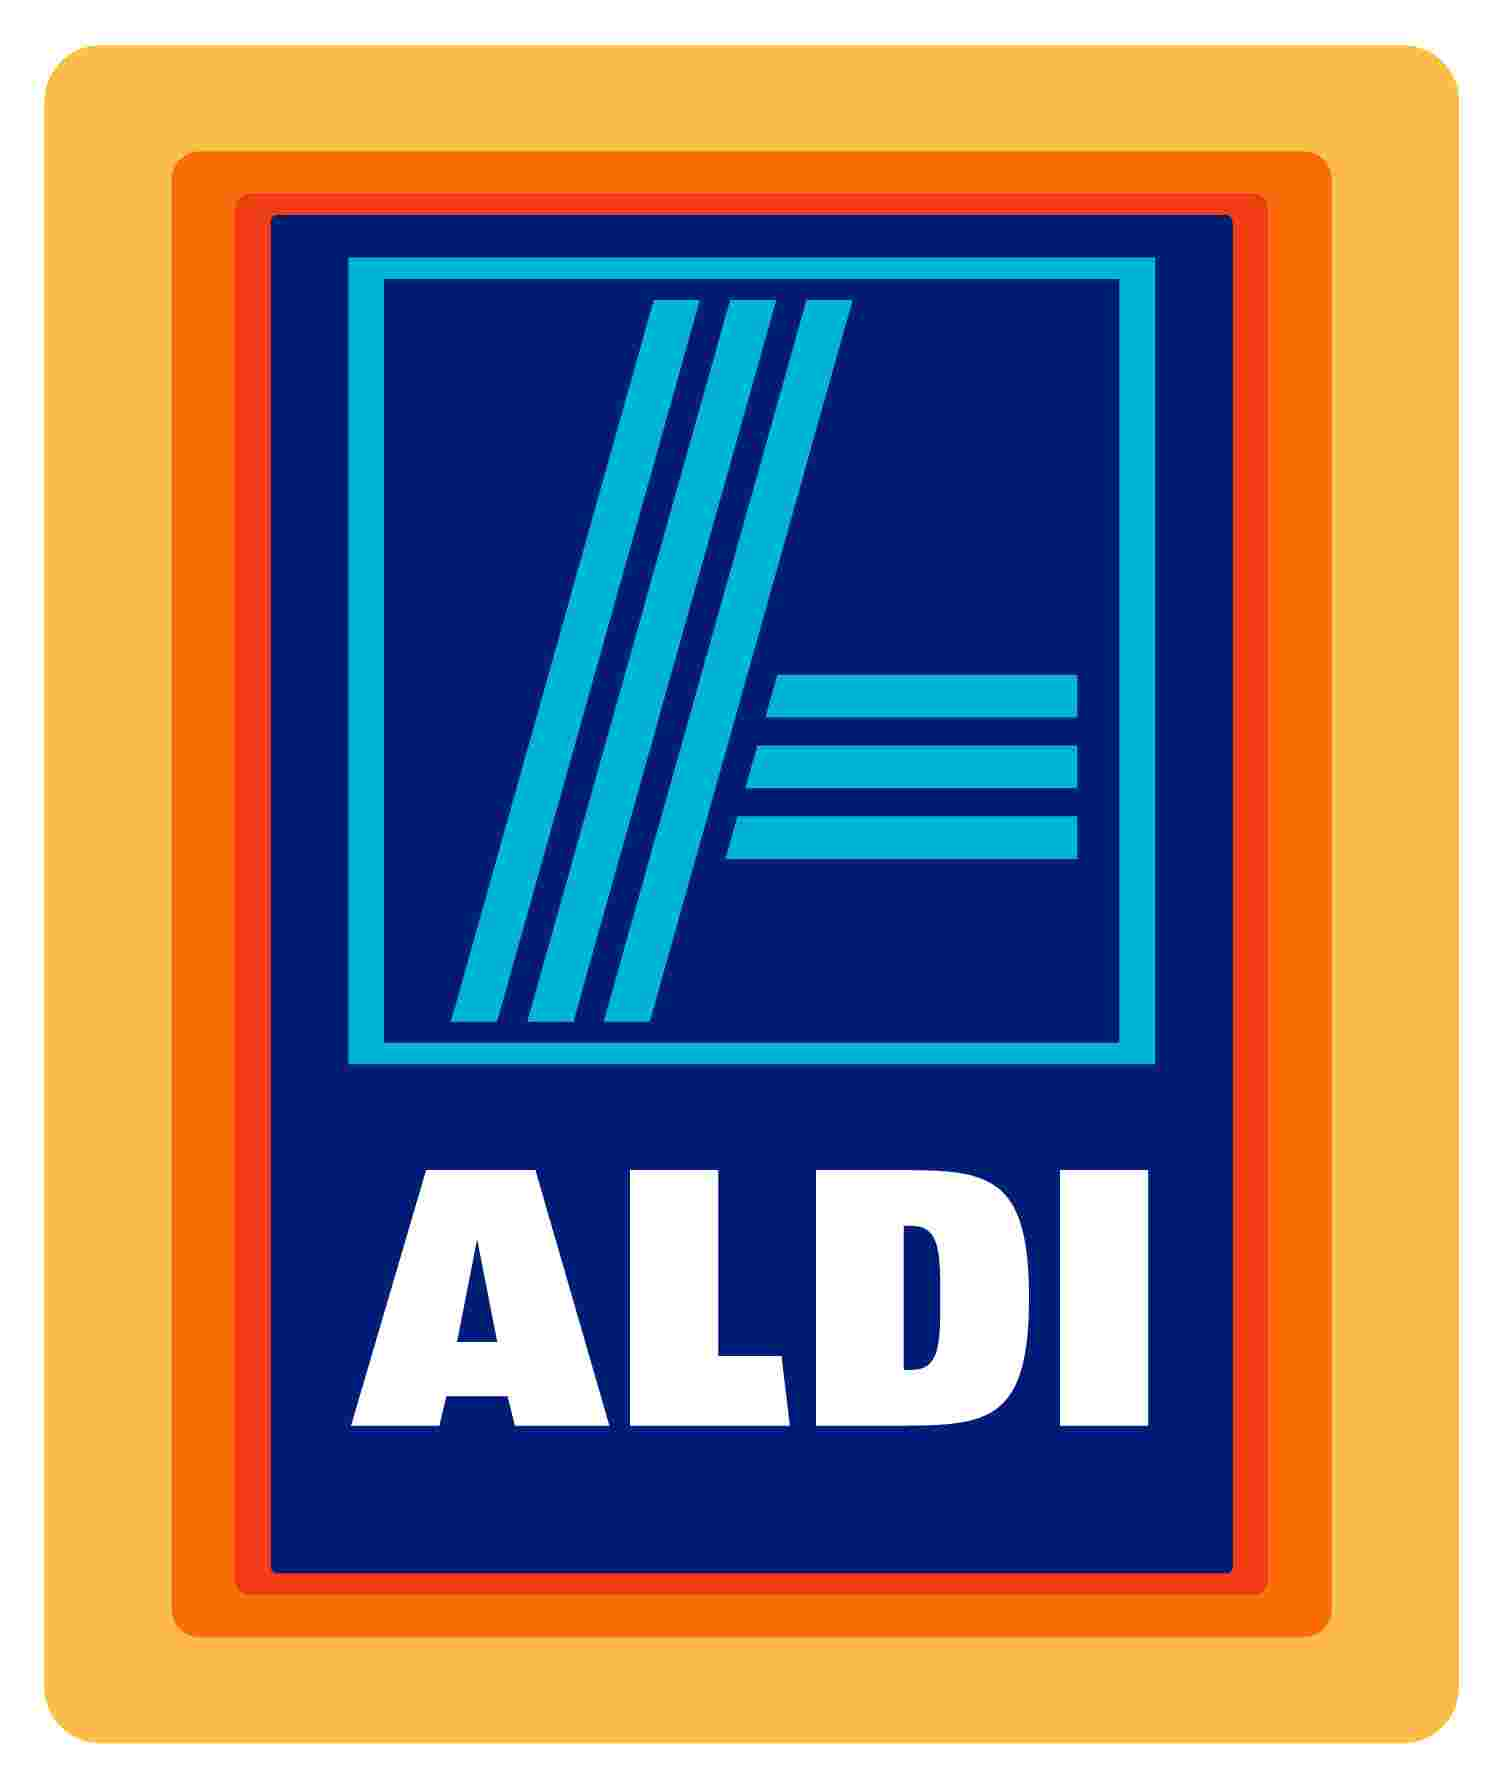 ALDI_3C_RGB_logo_kicsi.jpg